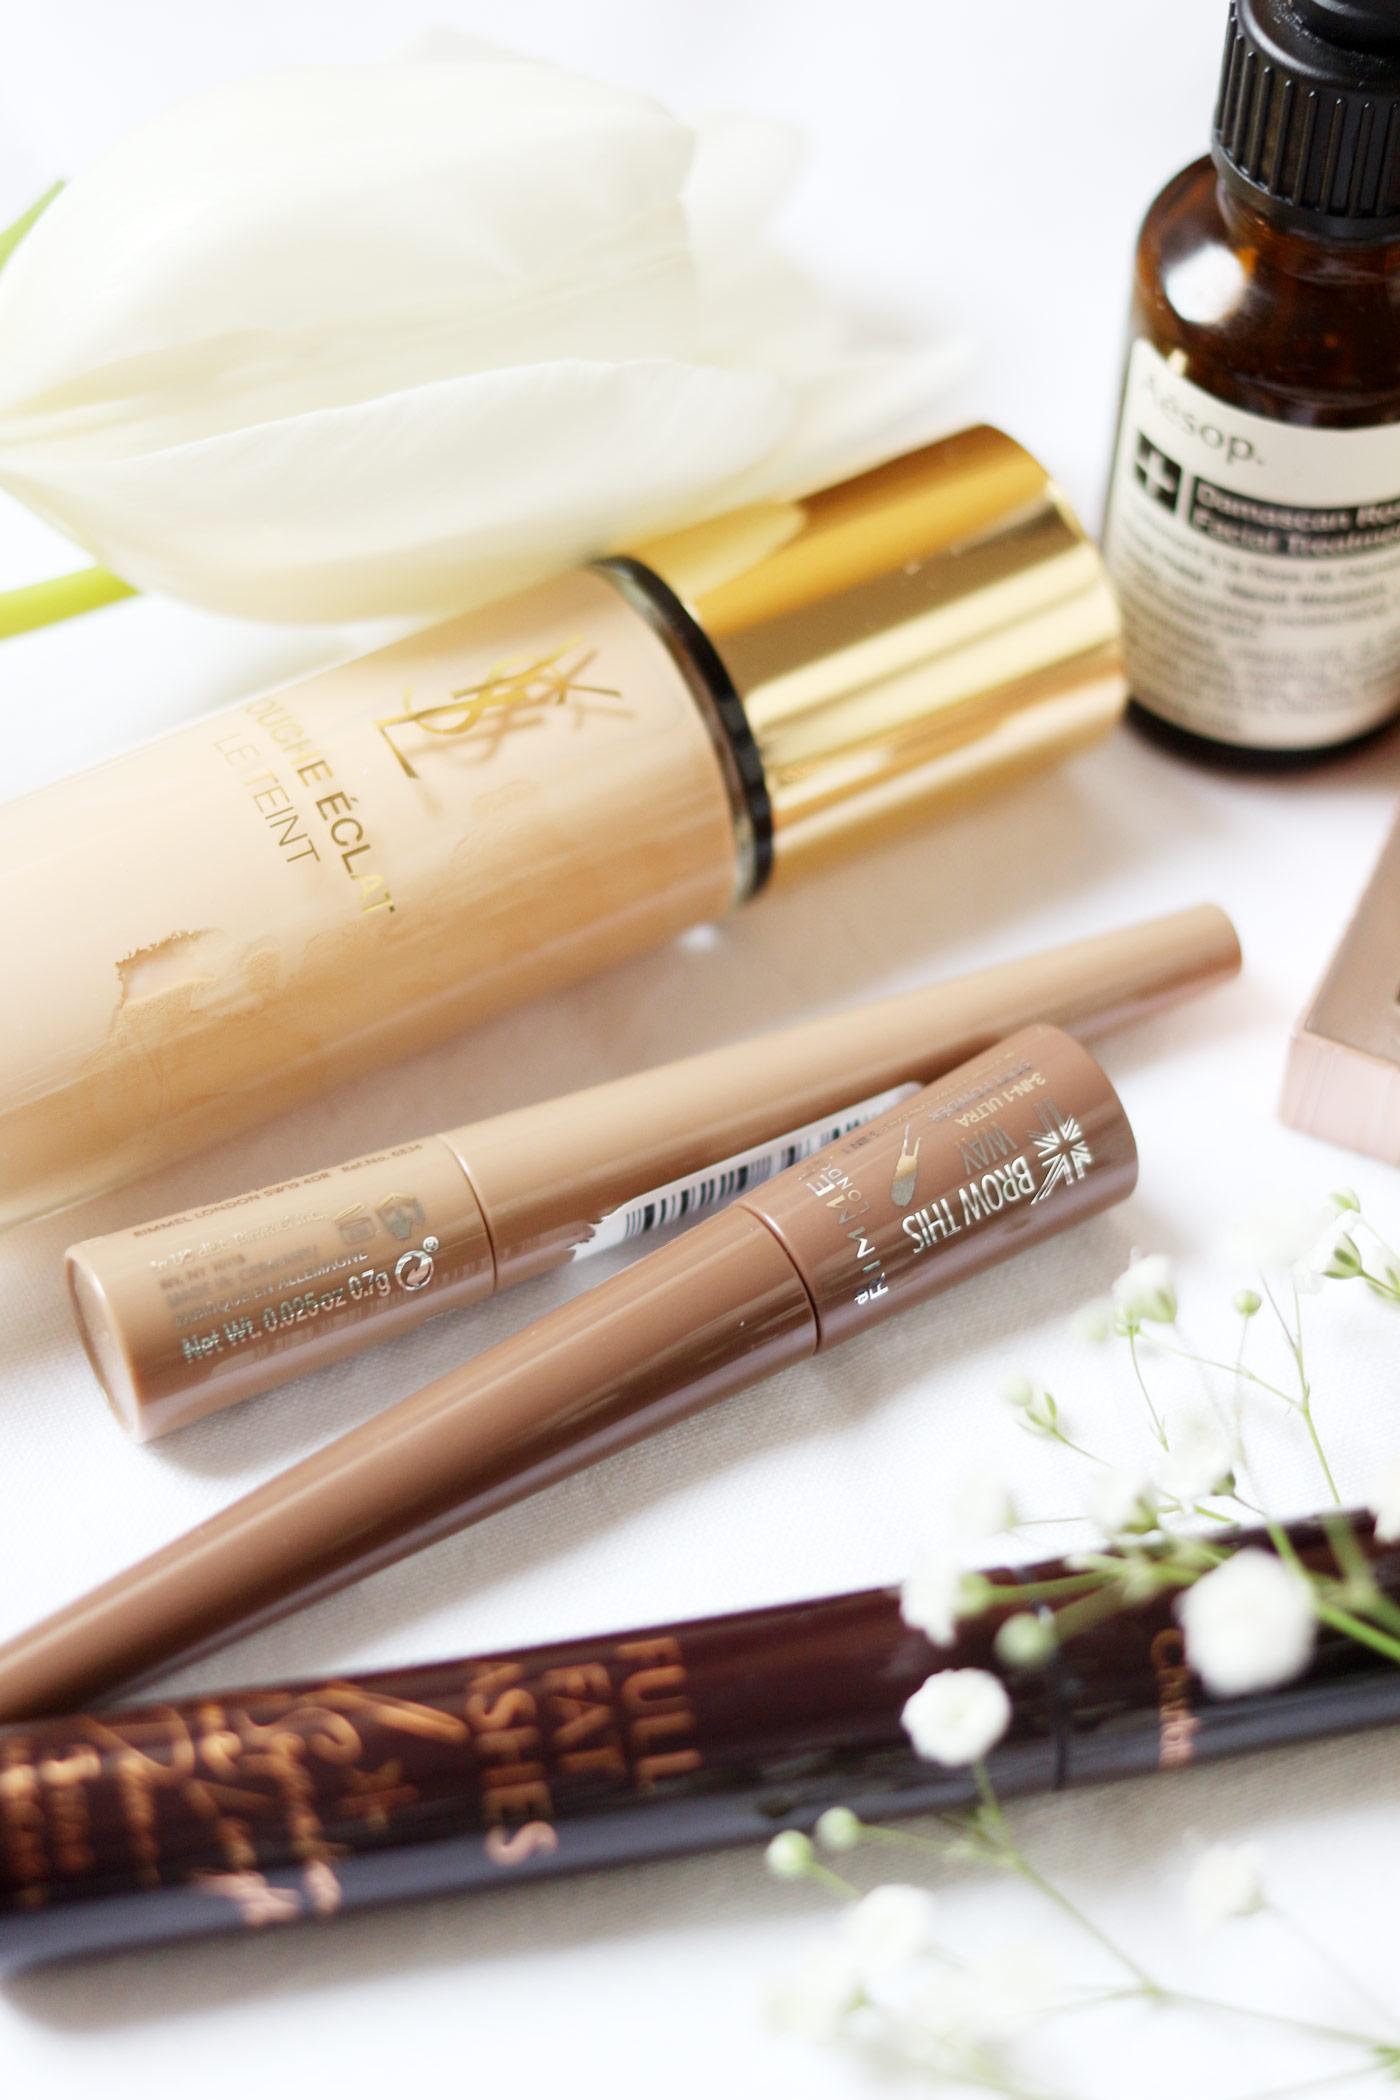 makeup-favourites-ysl-touche-eclat-foundation-NARS-vera-UD-naked-basics-2